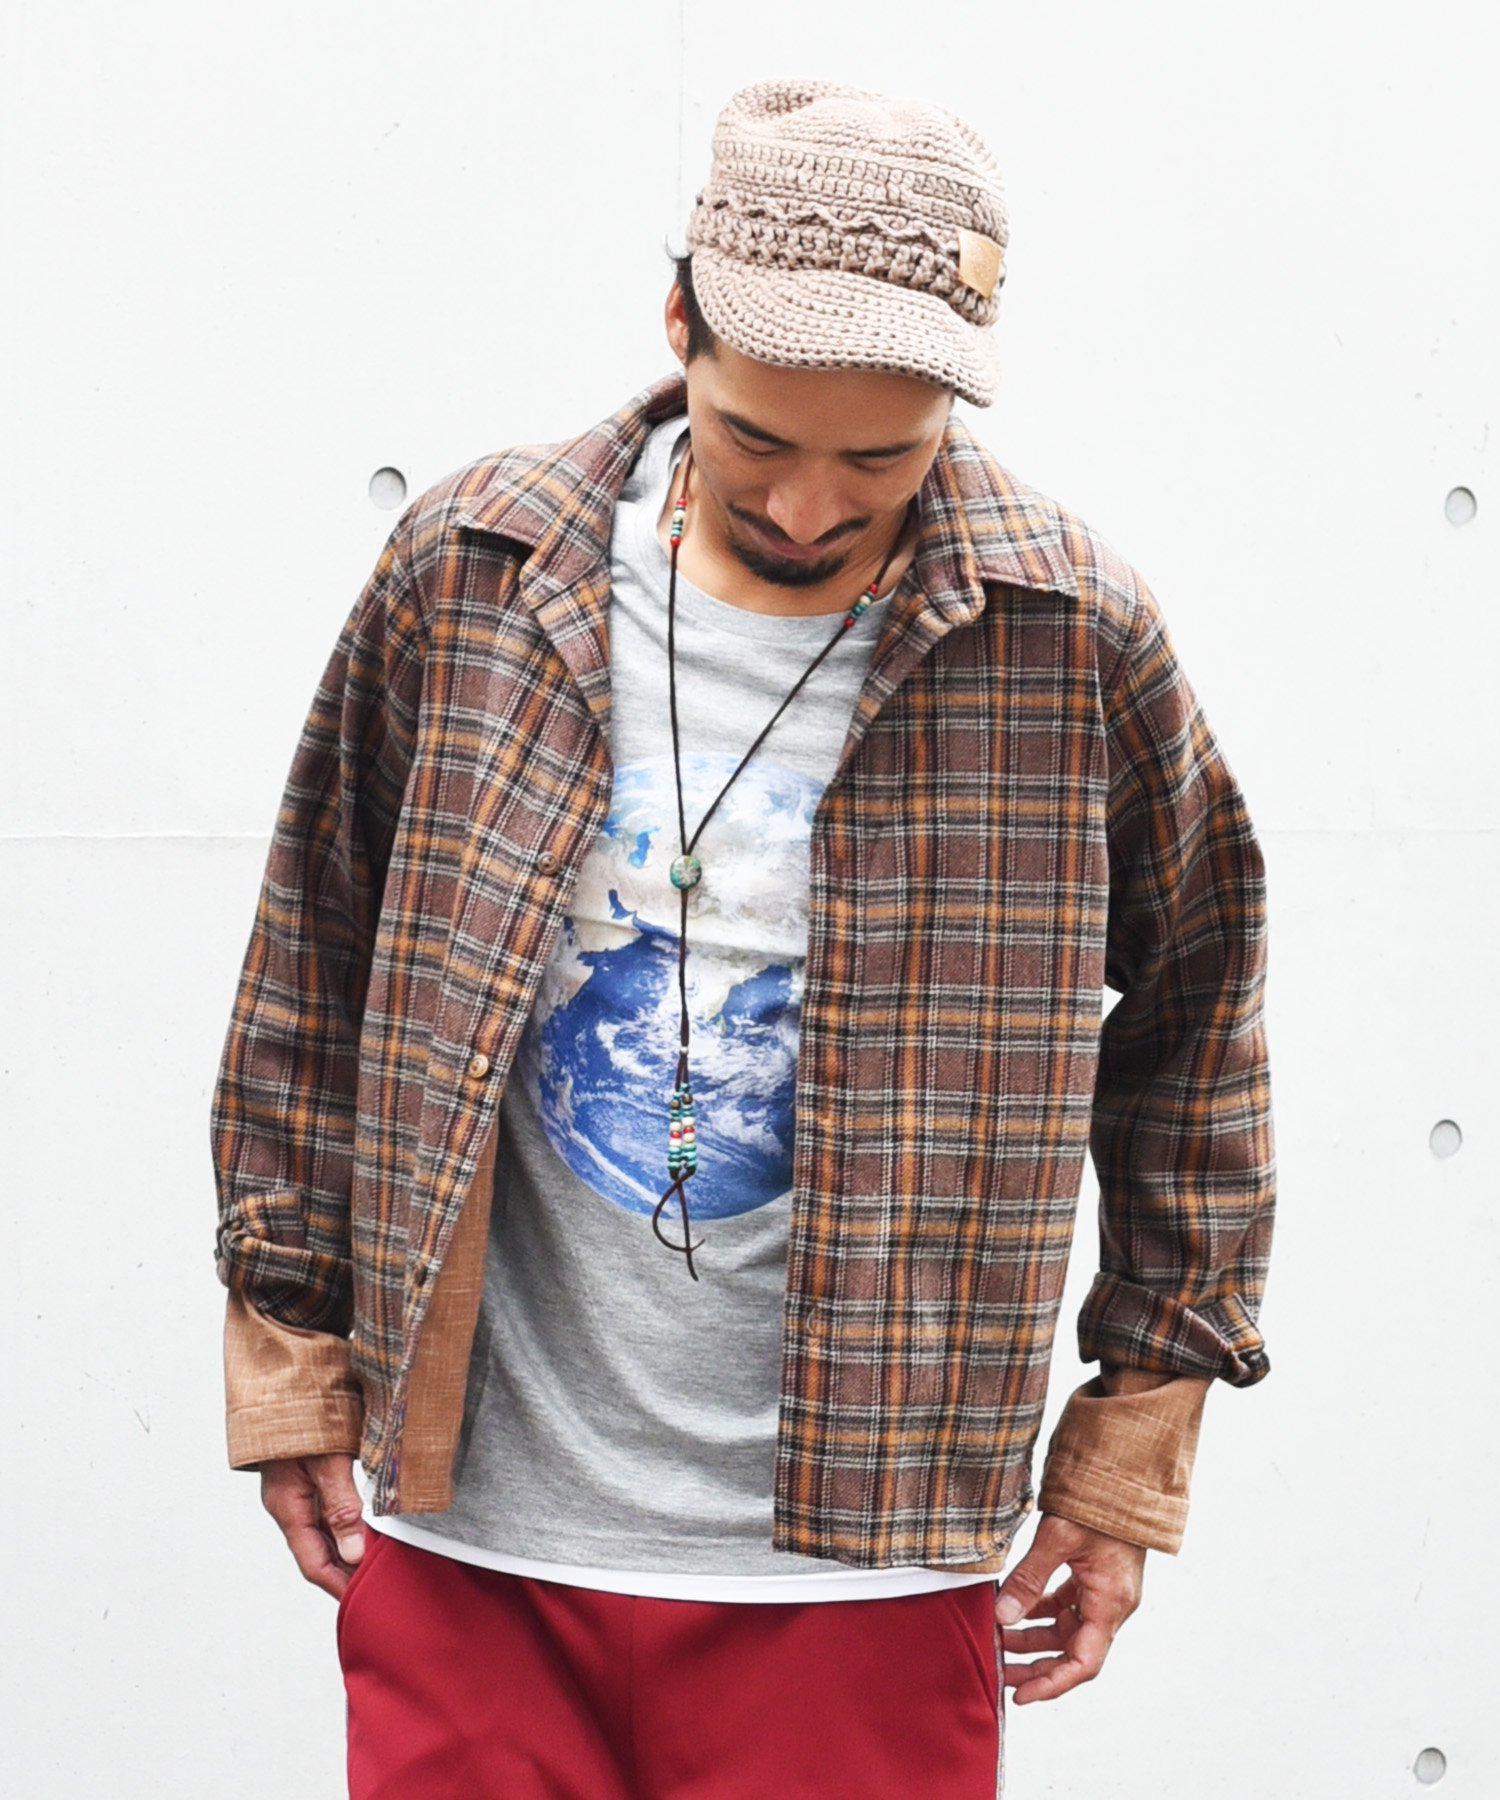 ARIGATO FAKKYU - アリガトファッキュ  Reversible shirt / 5 colors